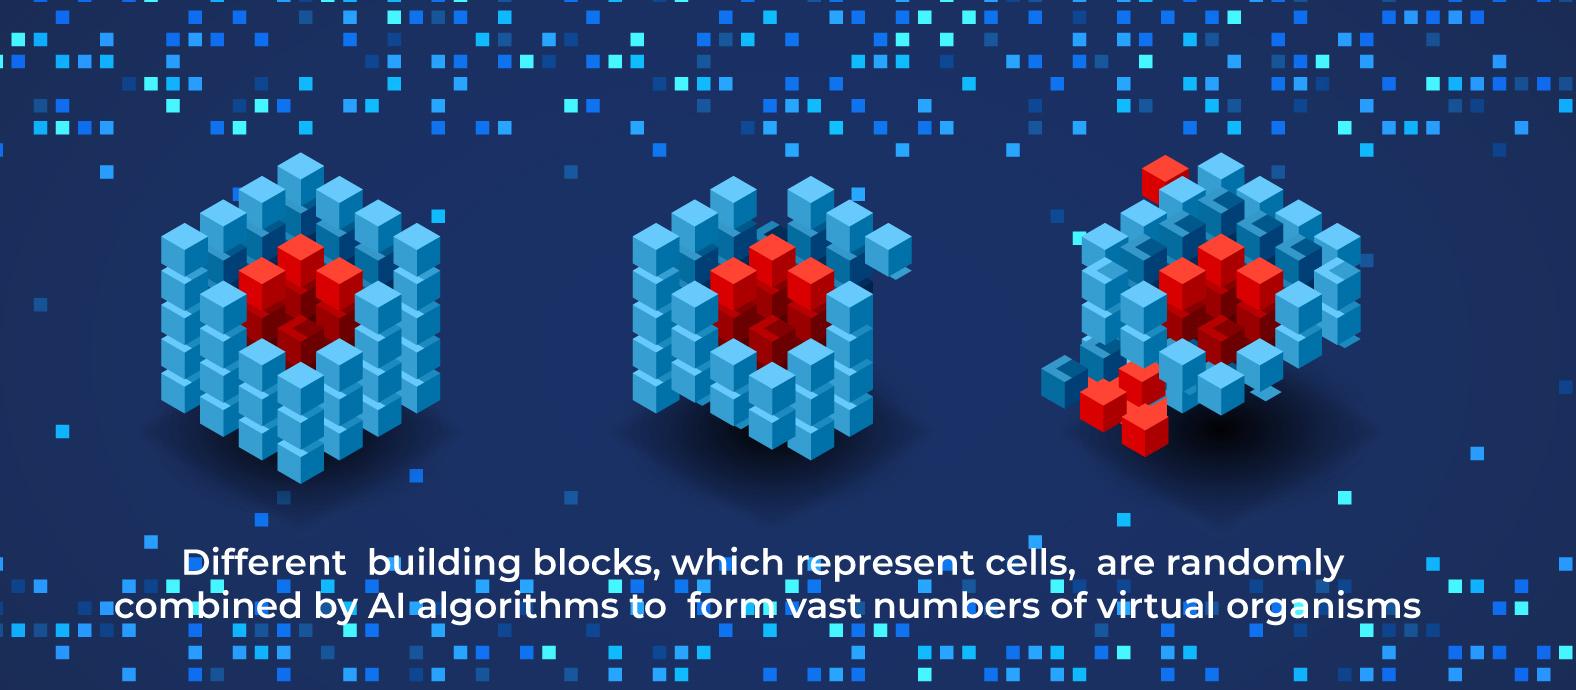 AI designed virtual organisms